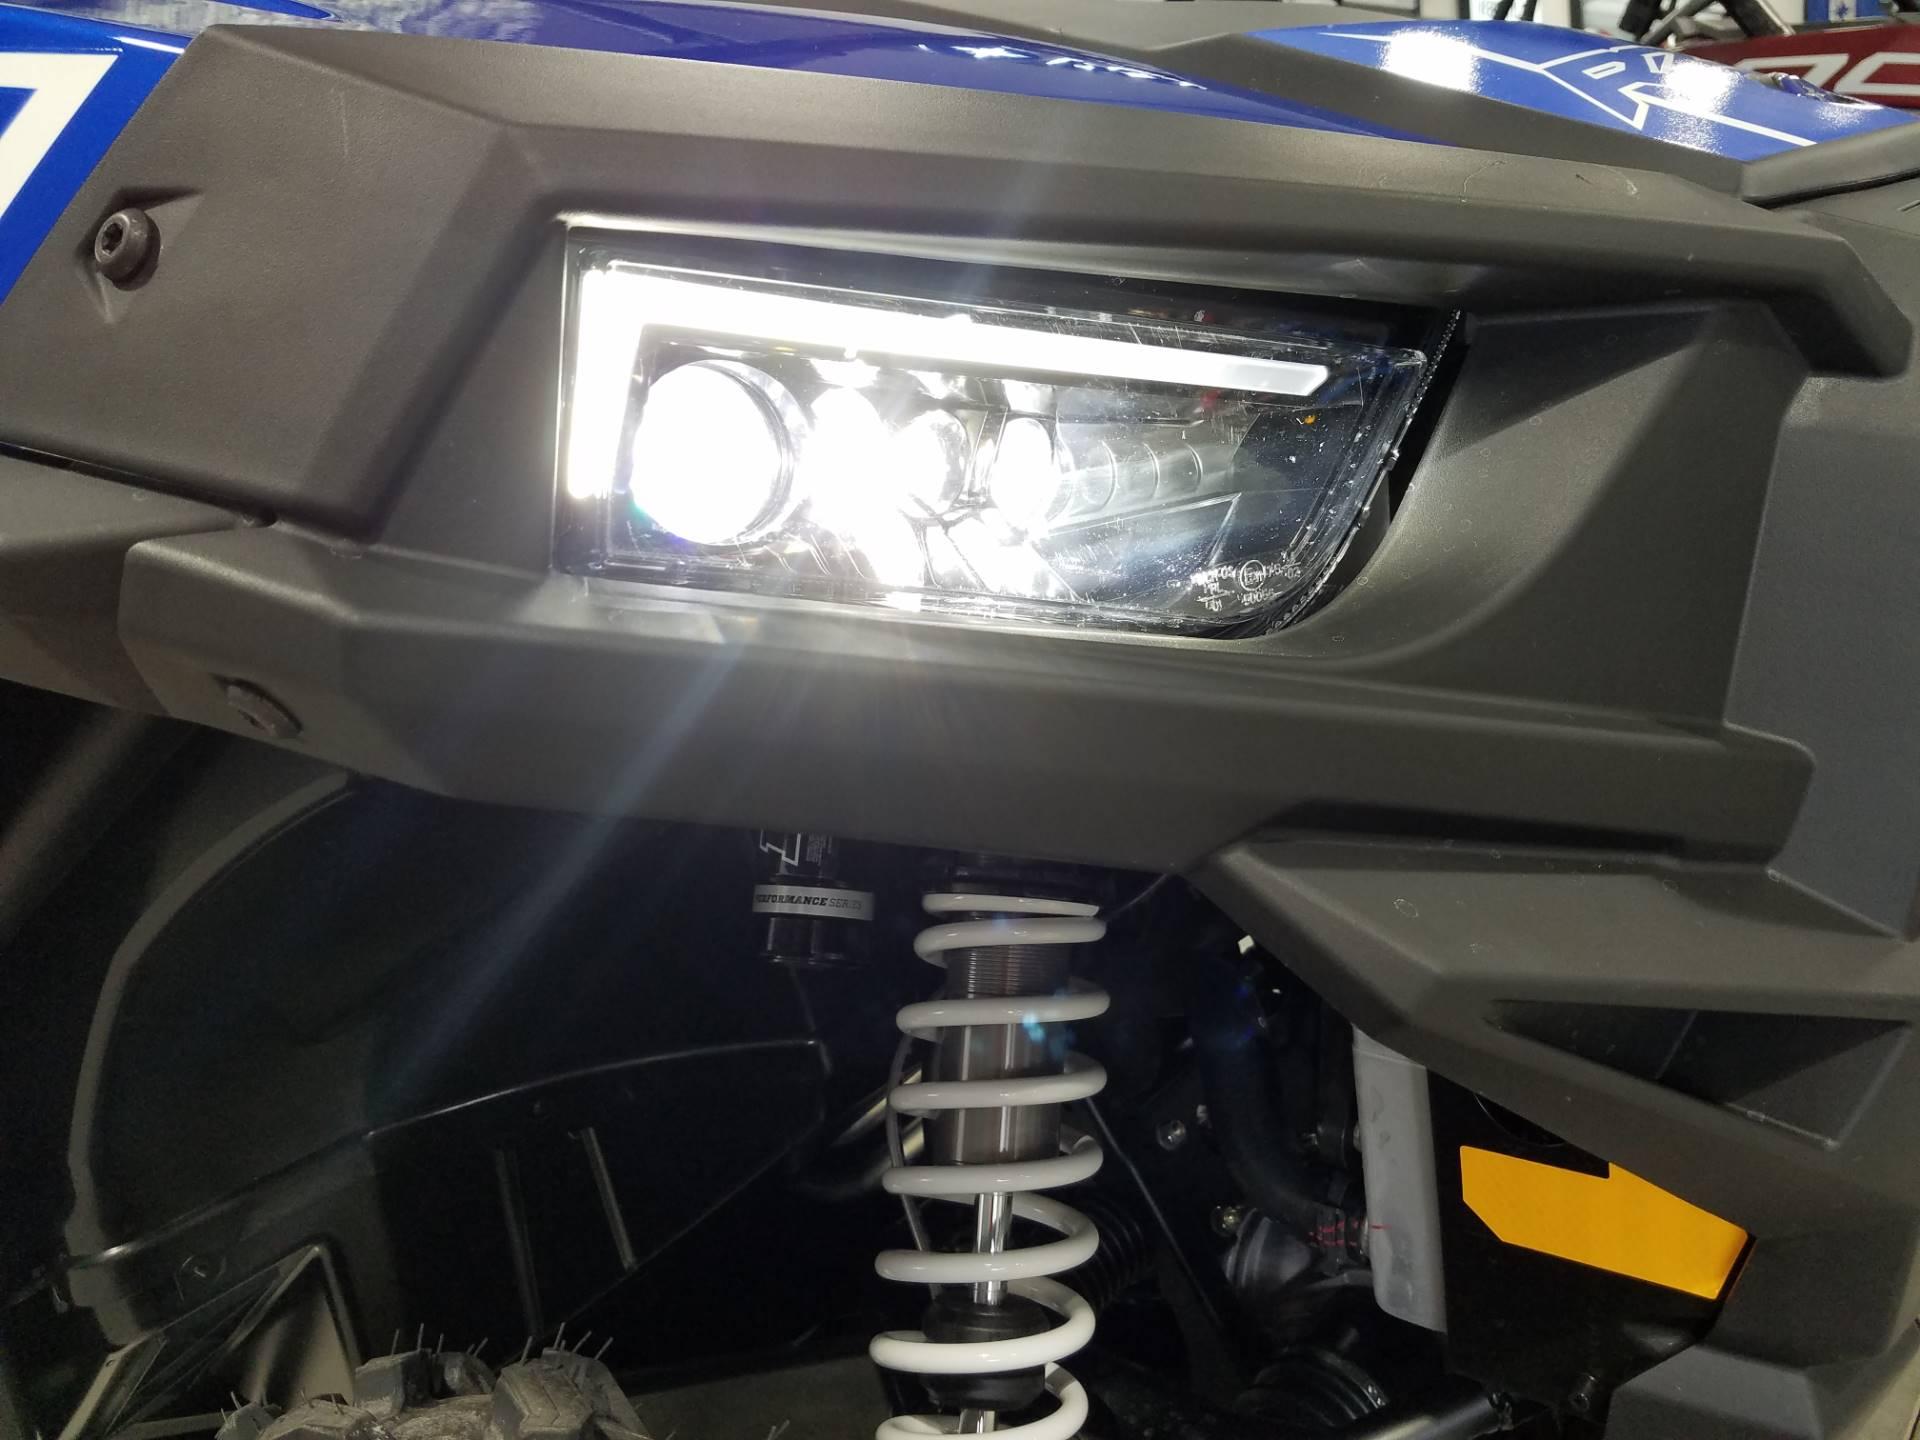 2020 Polaris RZR 900 EPS FOX Edition in Rapid City, South Dakota